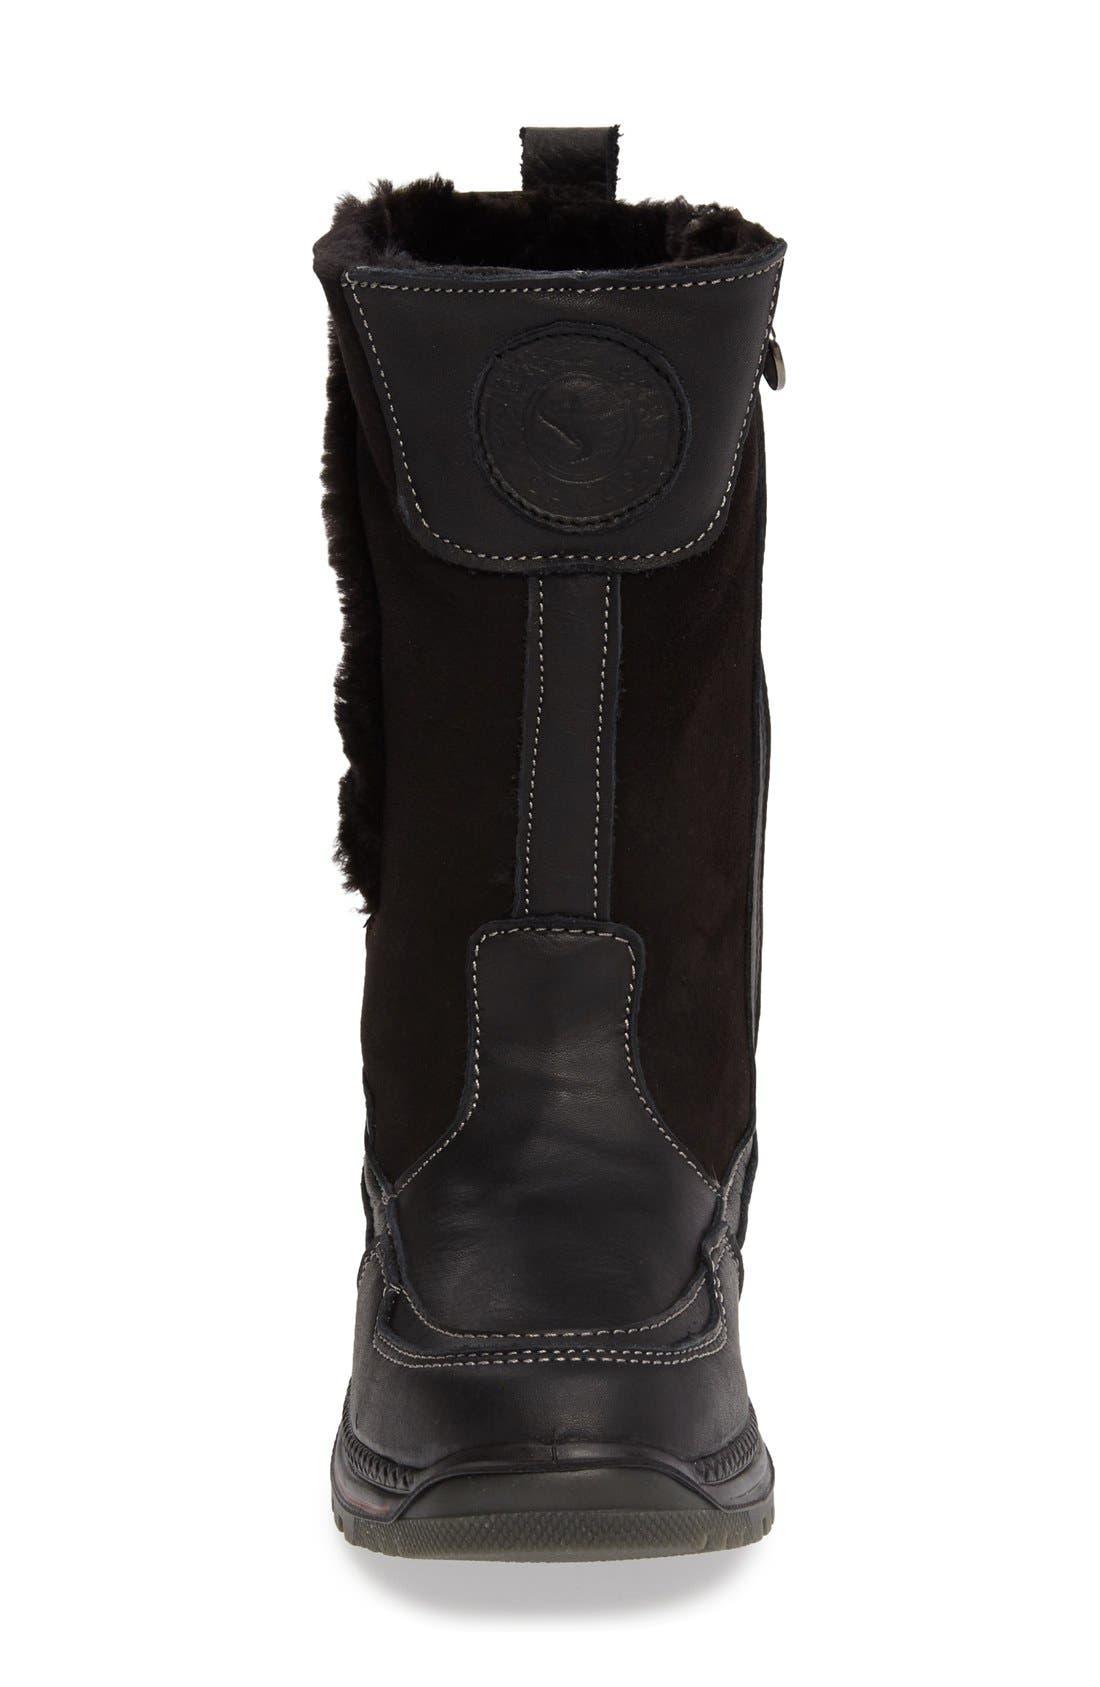 Seraphine Genuine Shearling Waterproof Winter Boot,                             Alternate thumbnail 7, color,                             001